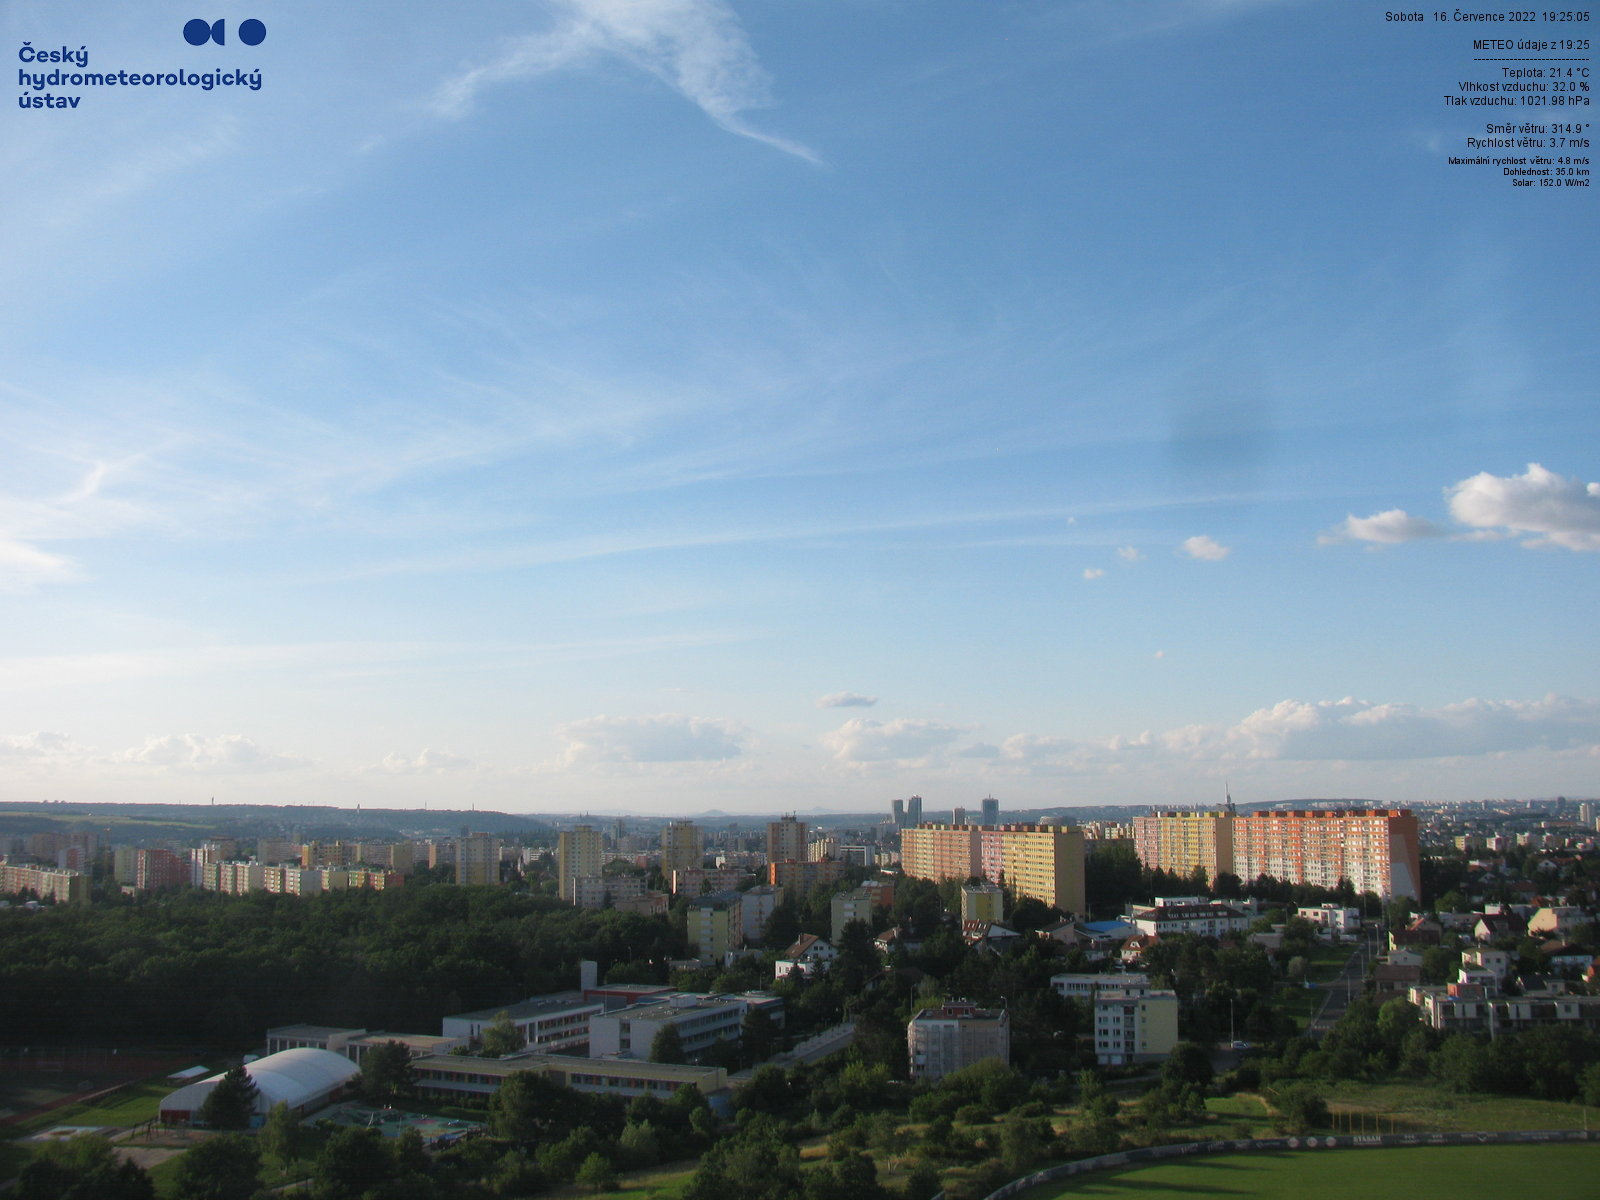 http://www.chmi.cz/files/portal/docs/meteo/kam/praha_libus2.jpg